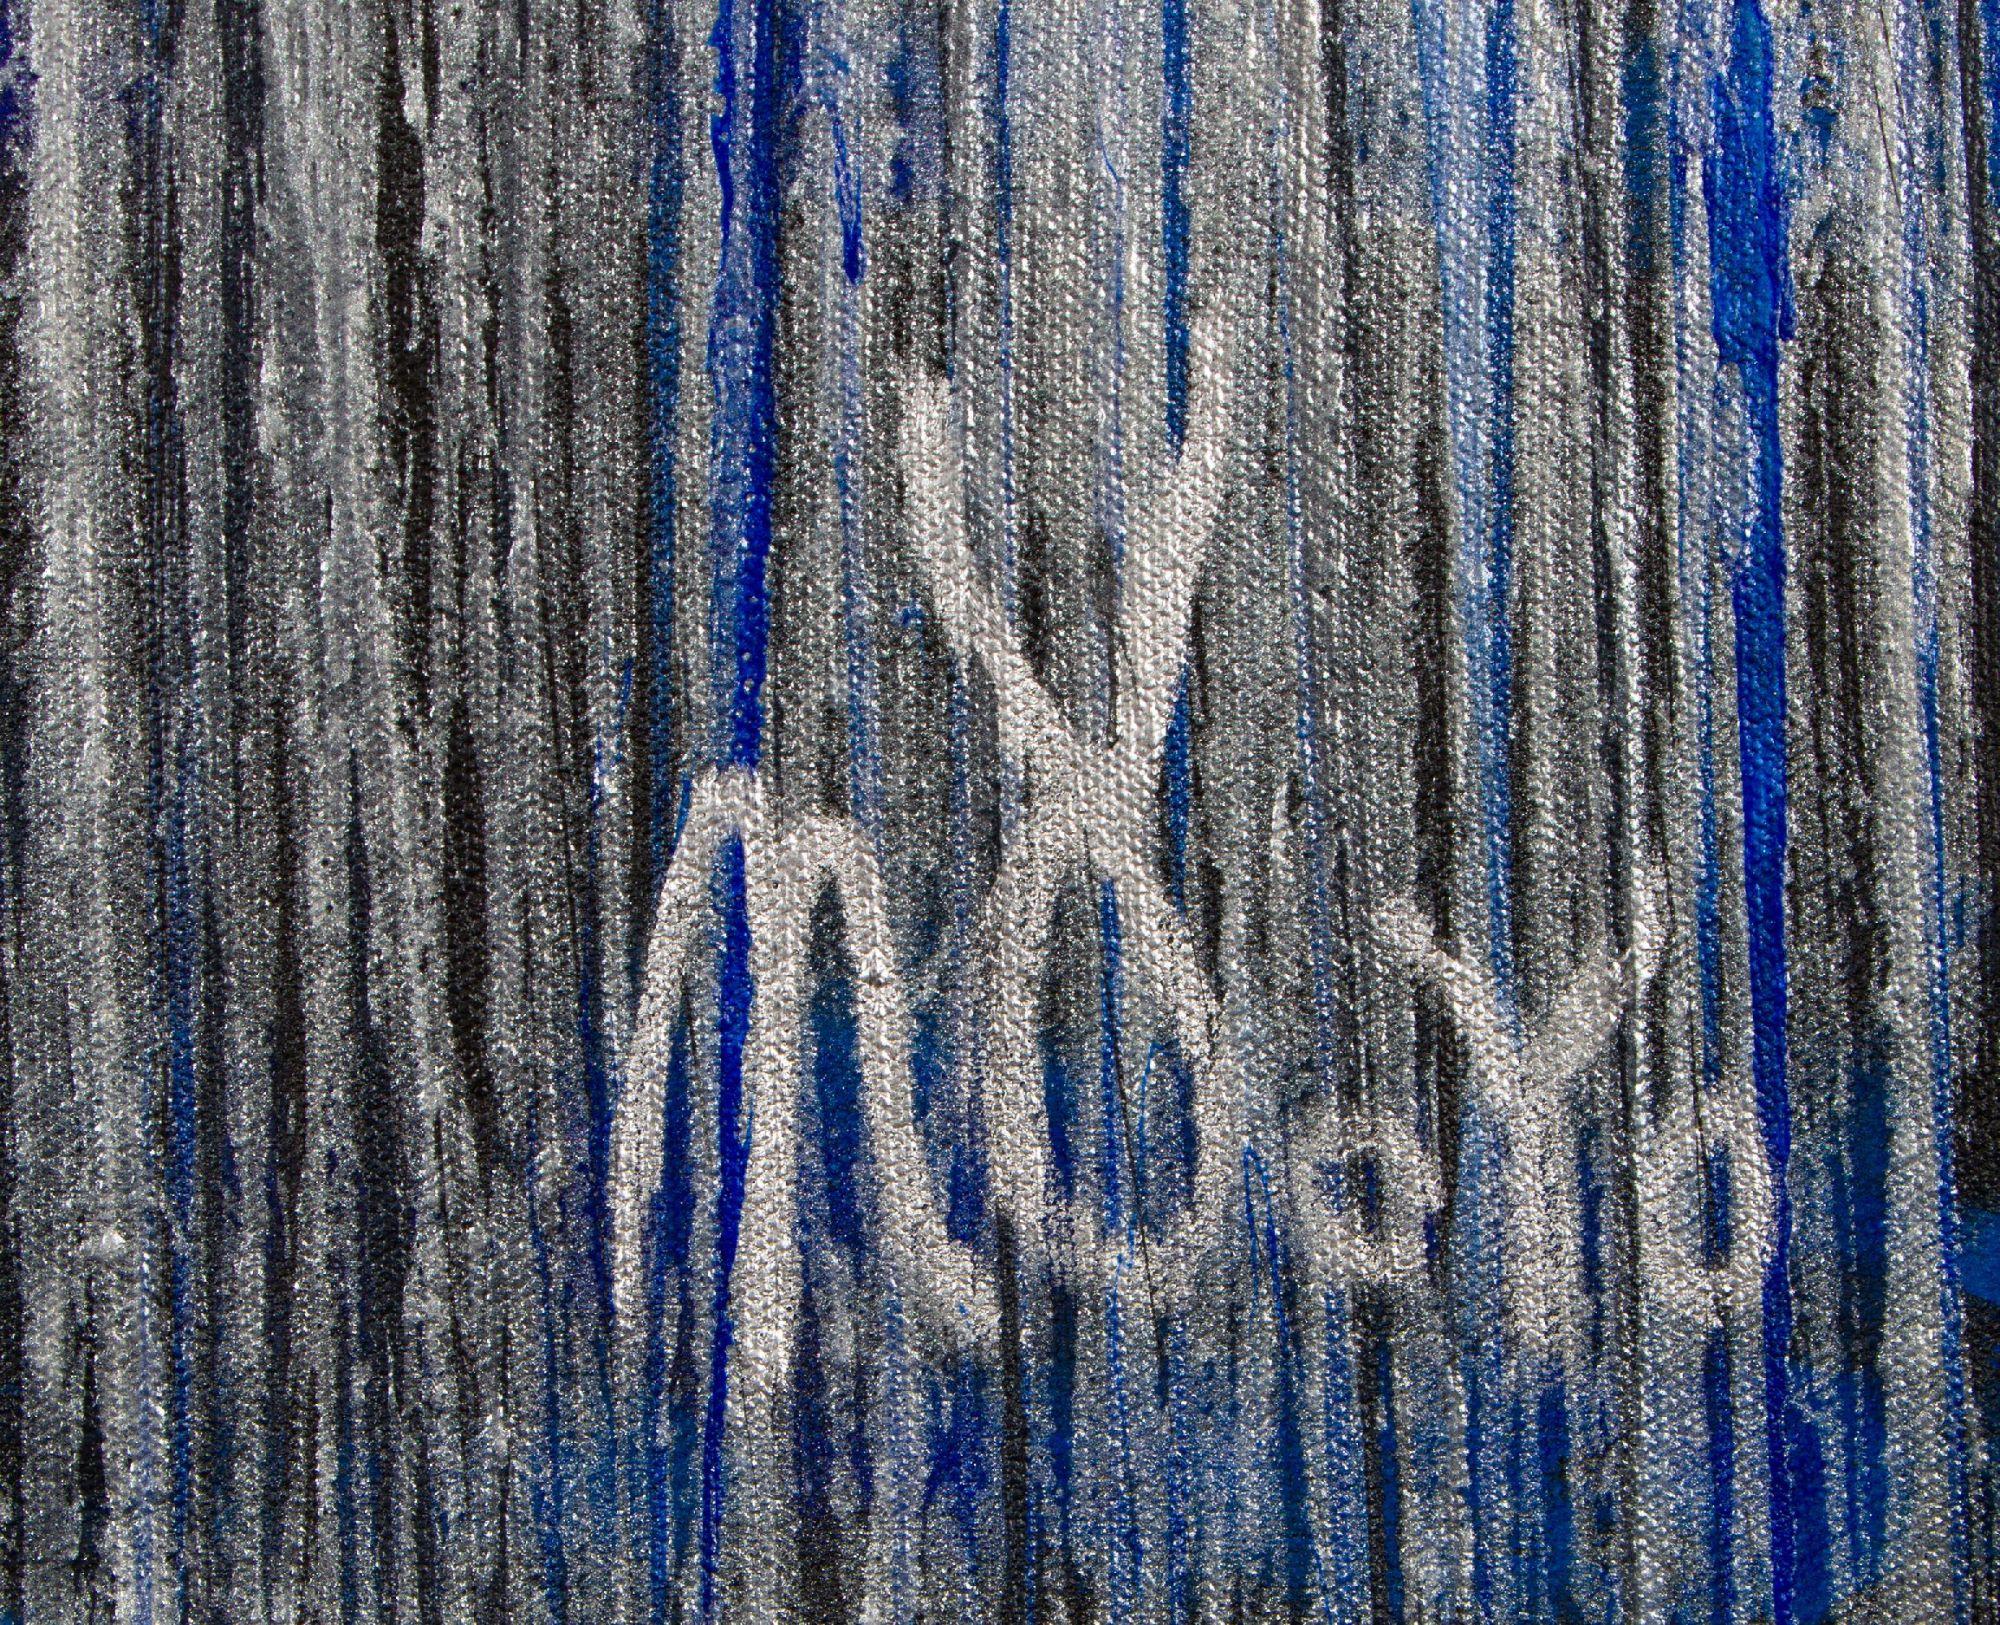 Signature - Room View - Nighttime Fearlessness 3 (2020) by Nestor Toro